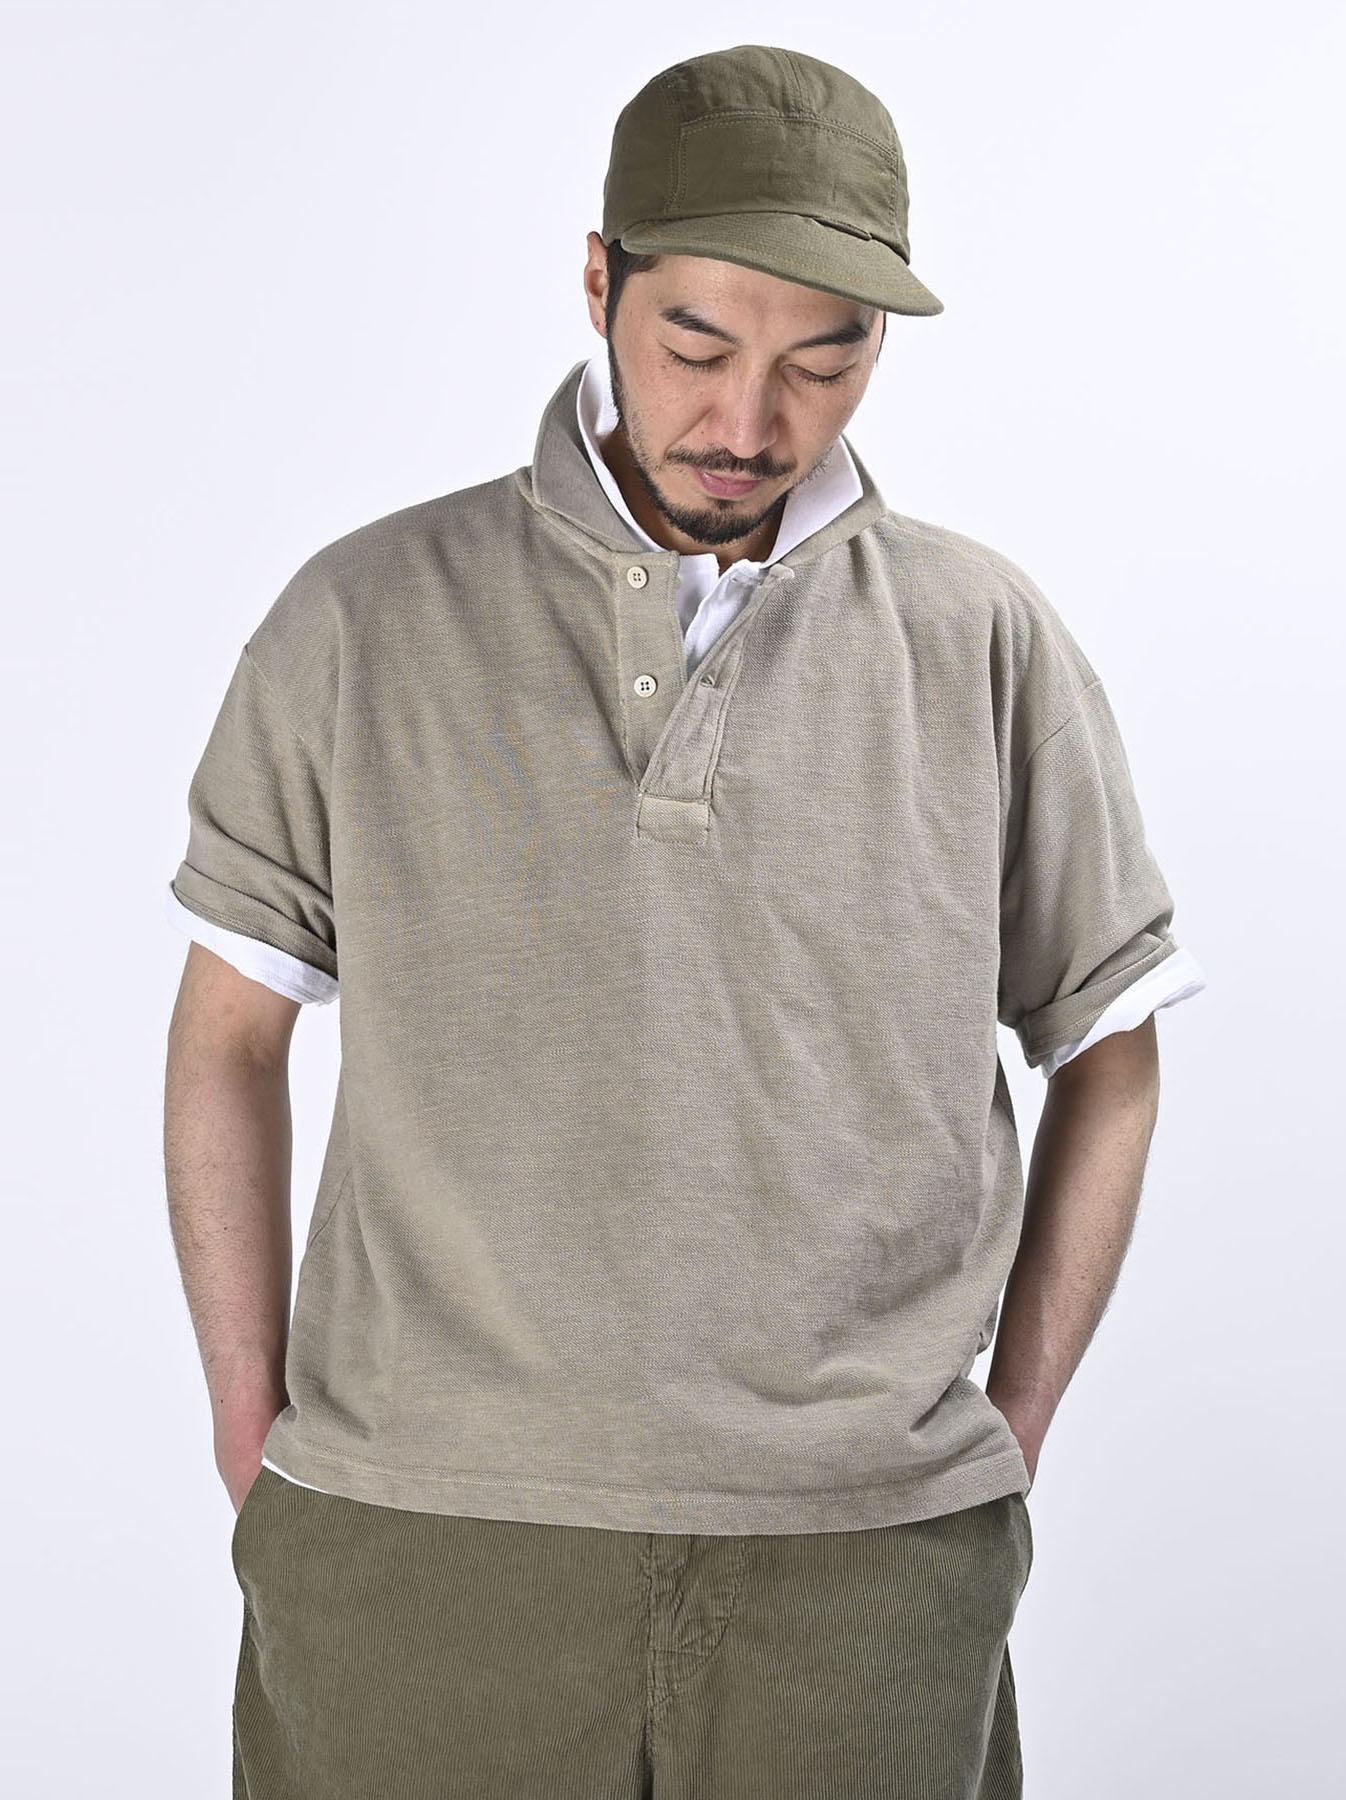 Kanoko Ocean Shiokaze Short-sleeved Polo Shirt (0521)-7